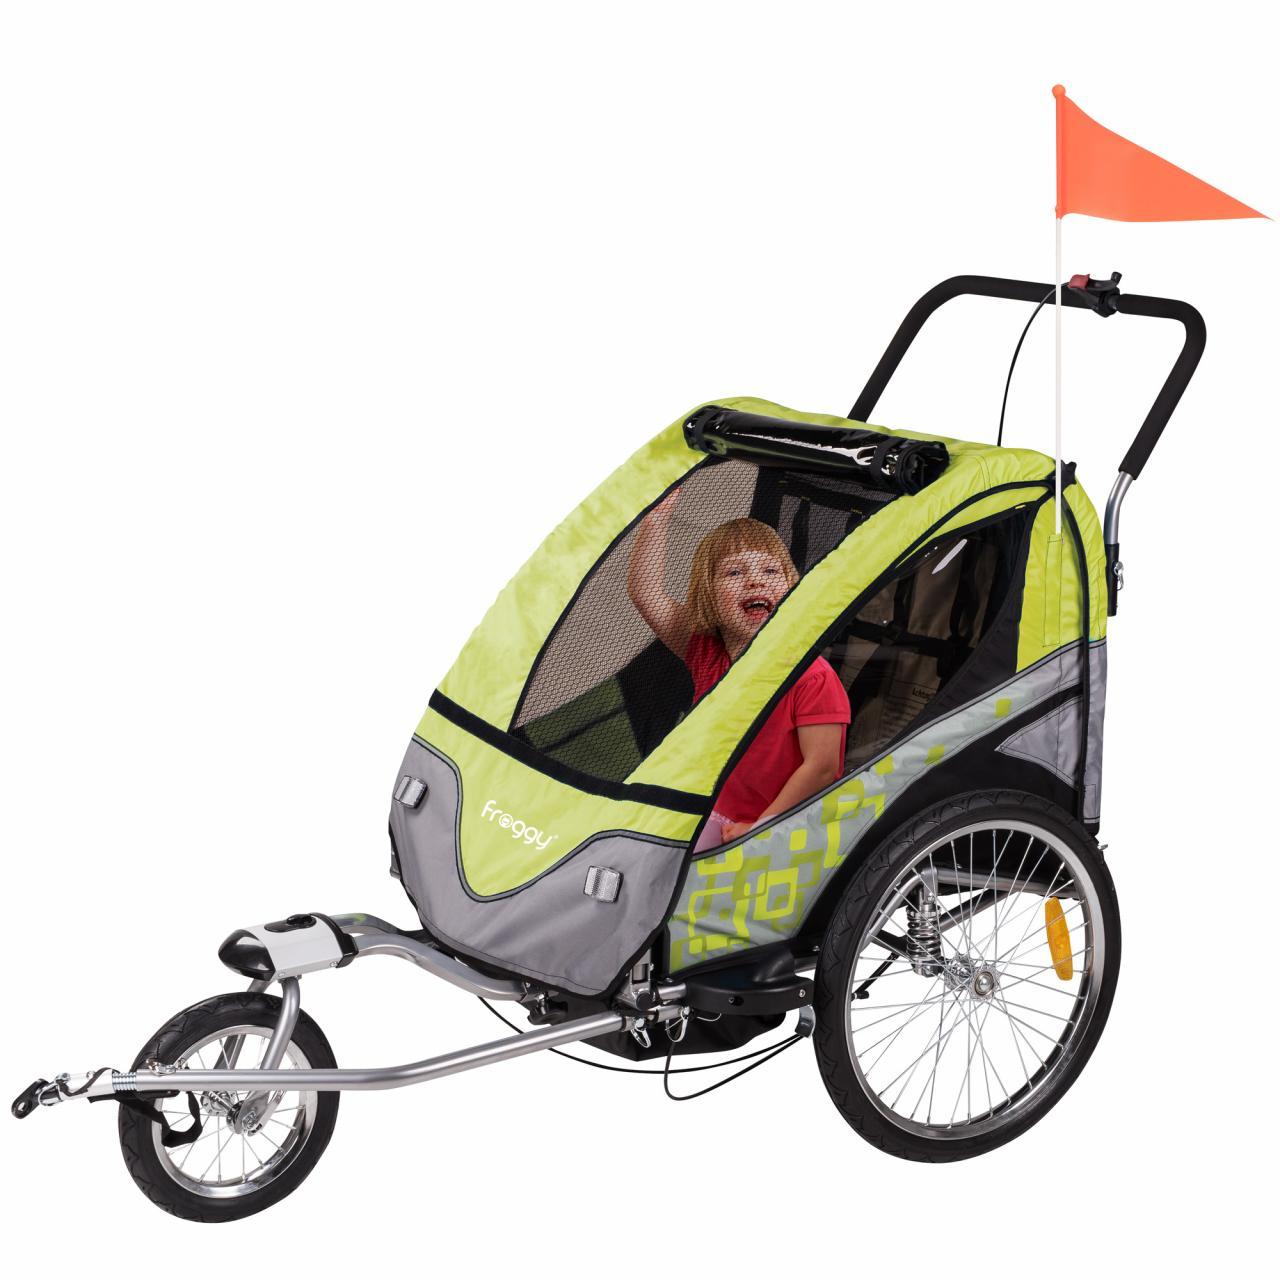 Kinderfahrradanhaenger-Fahrradanhaenger-Kinderanhaenger-Jogger-Stahl-Modellwahl